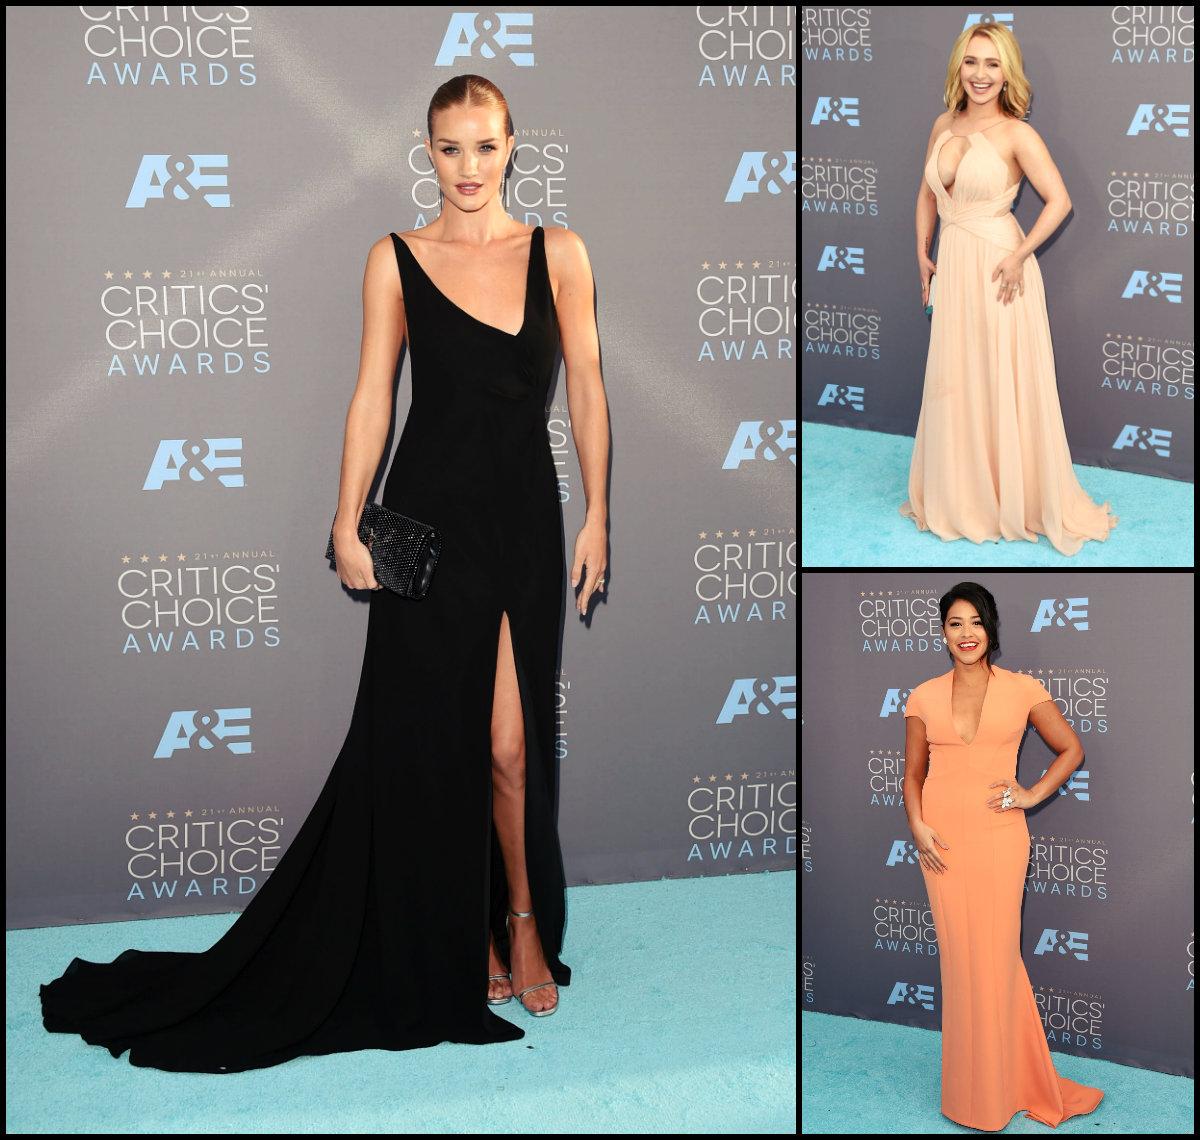 Critics Choice Awards 2016 Hairstyles